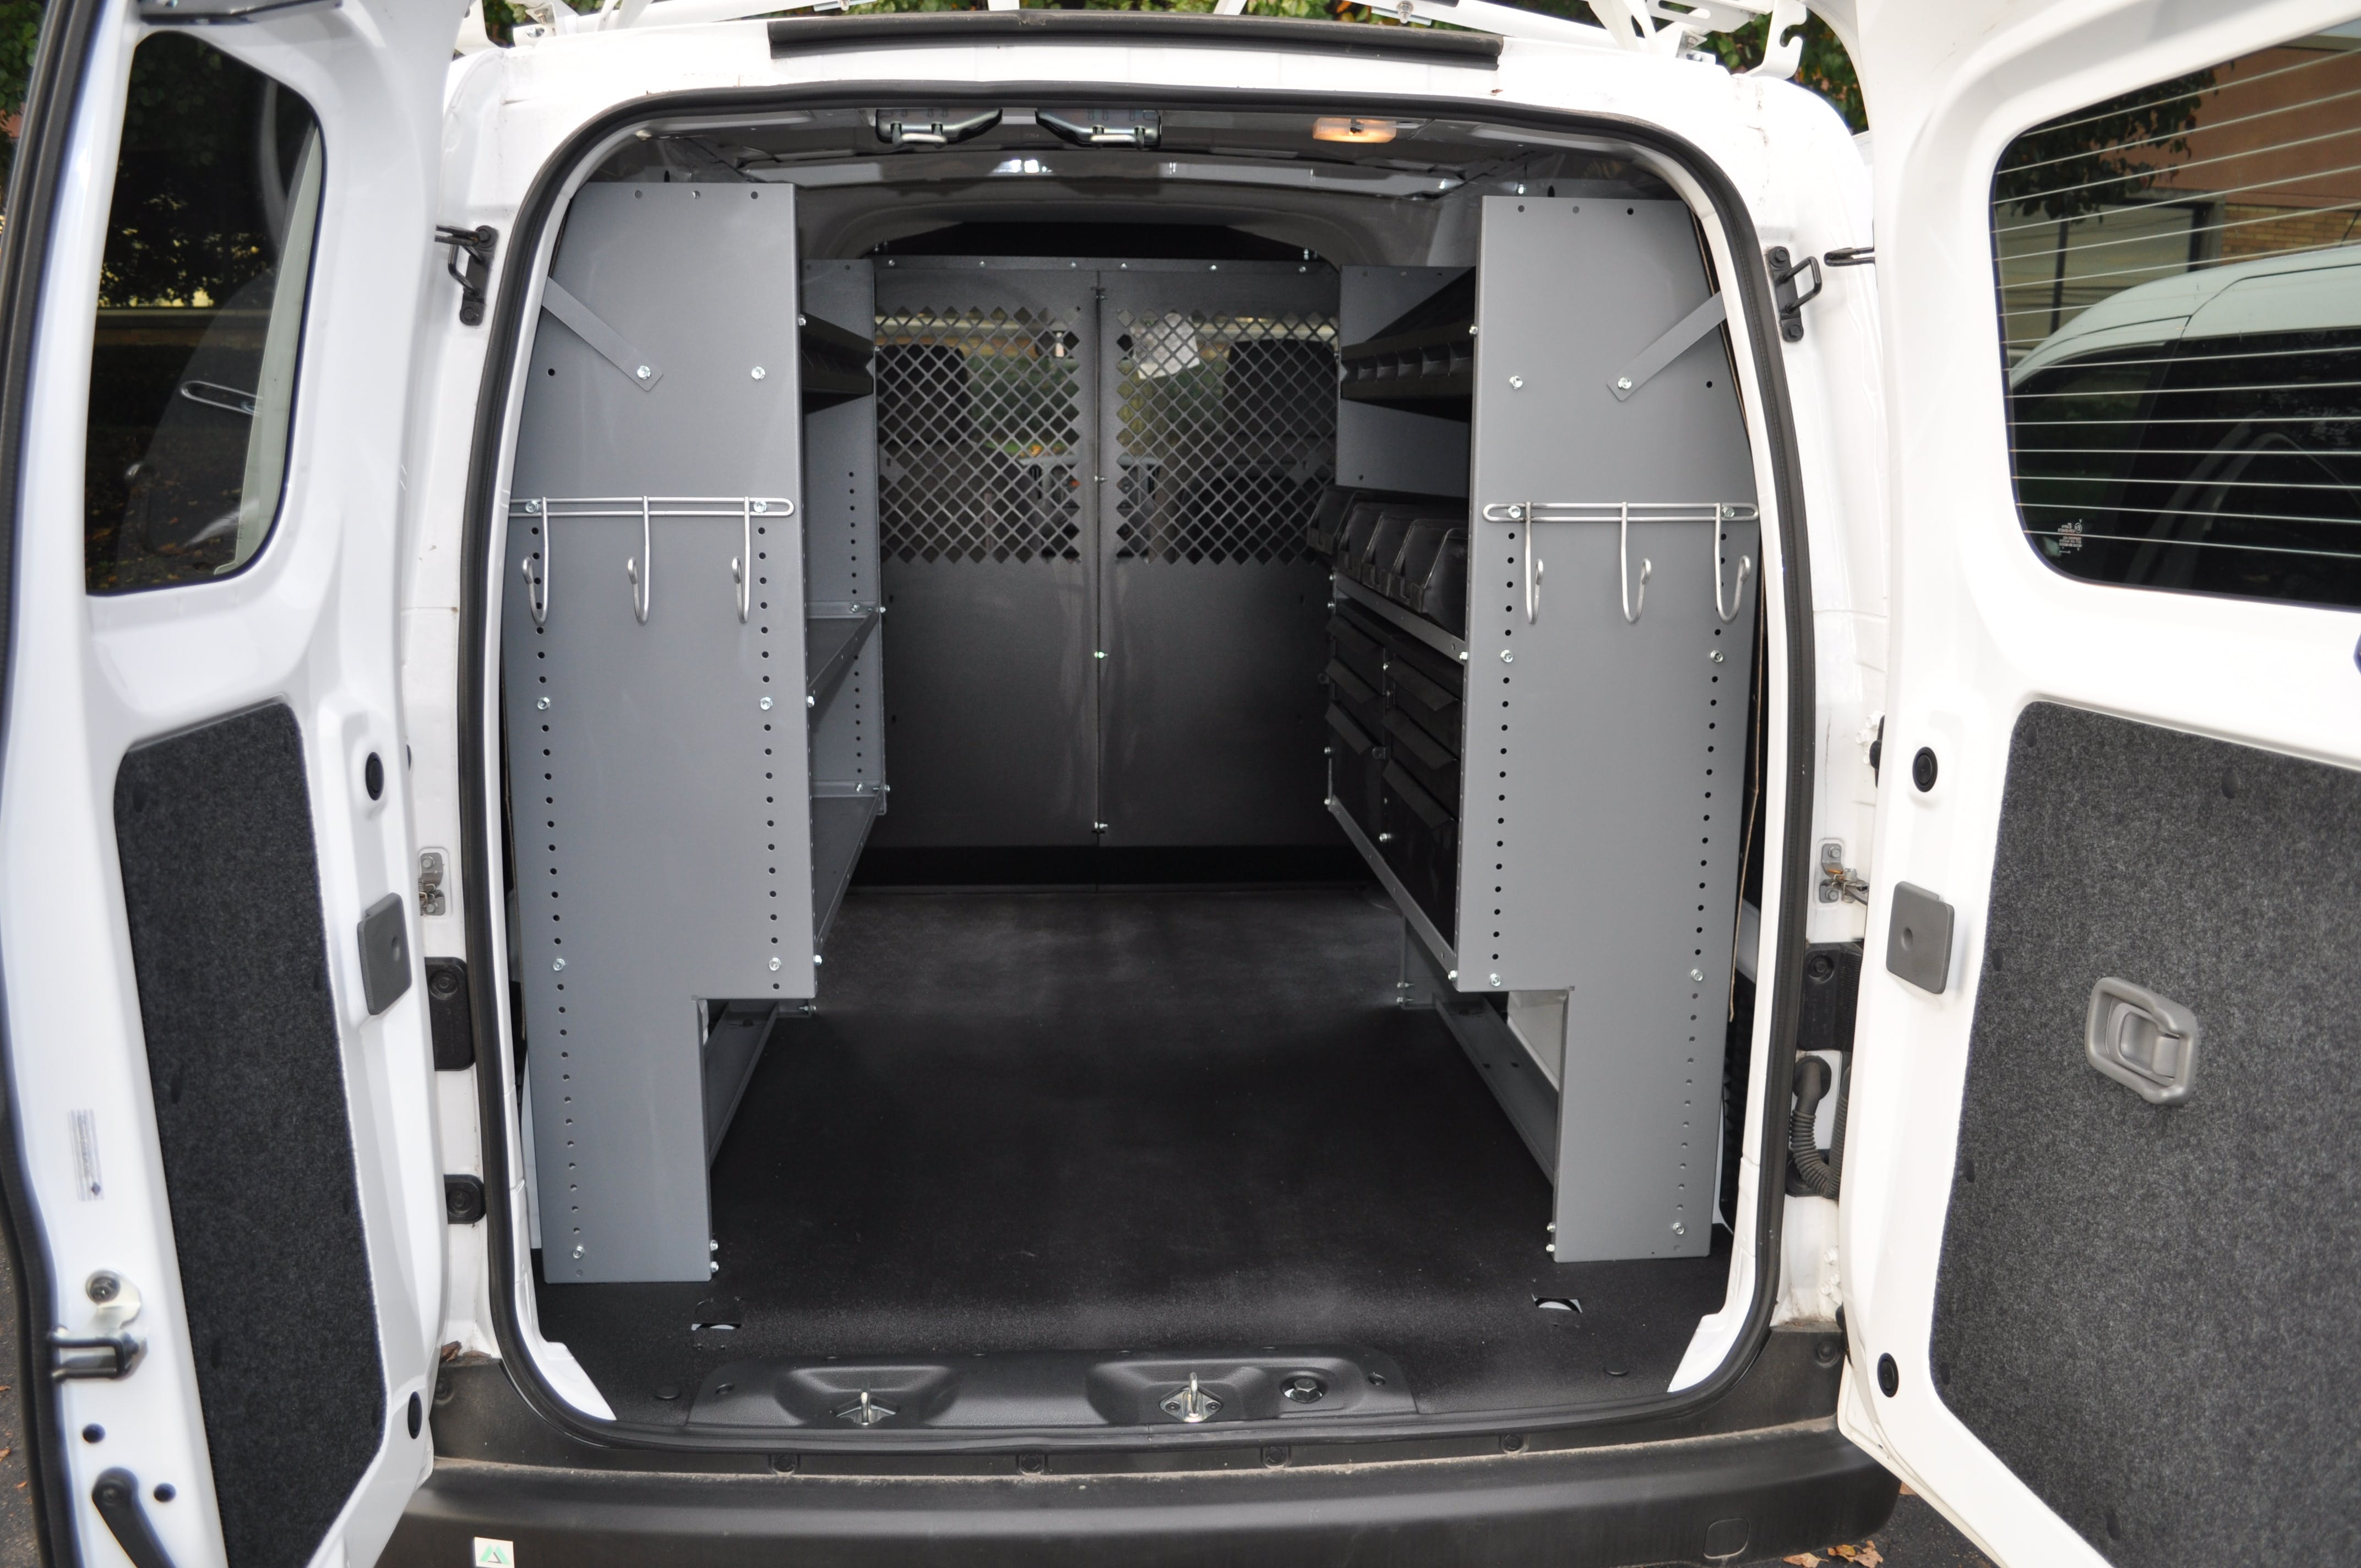 Upfits for Compact Vans